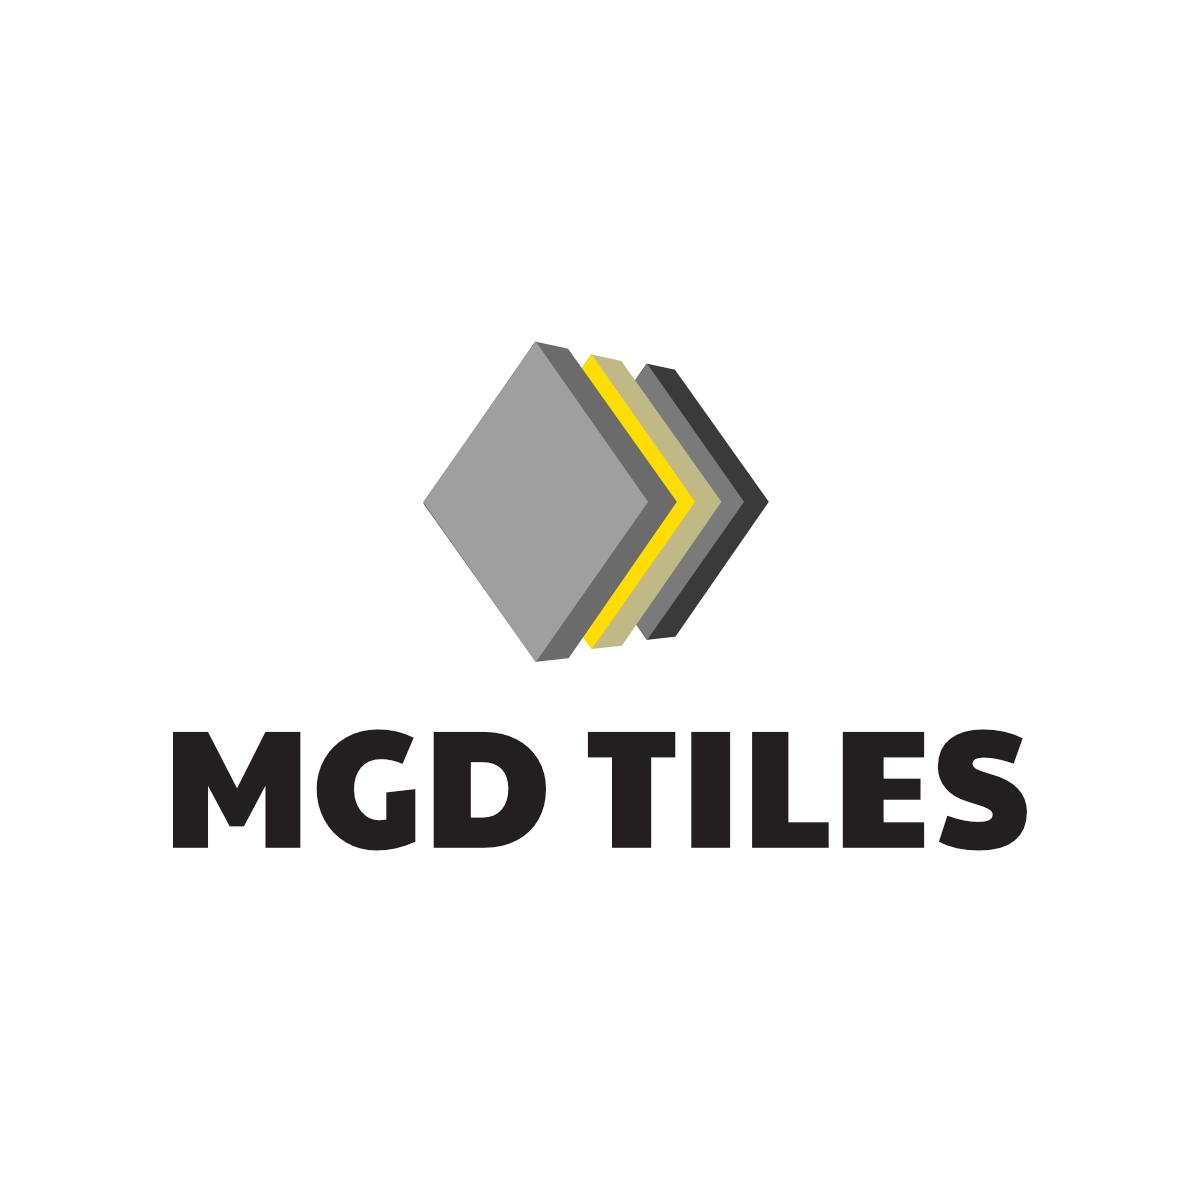 Mgd tiles